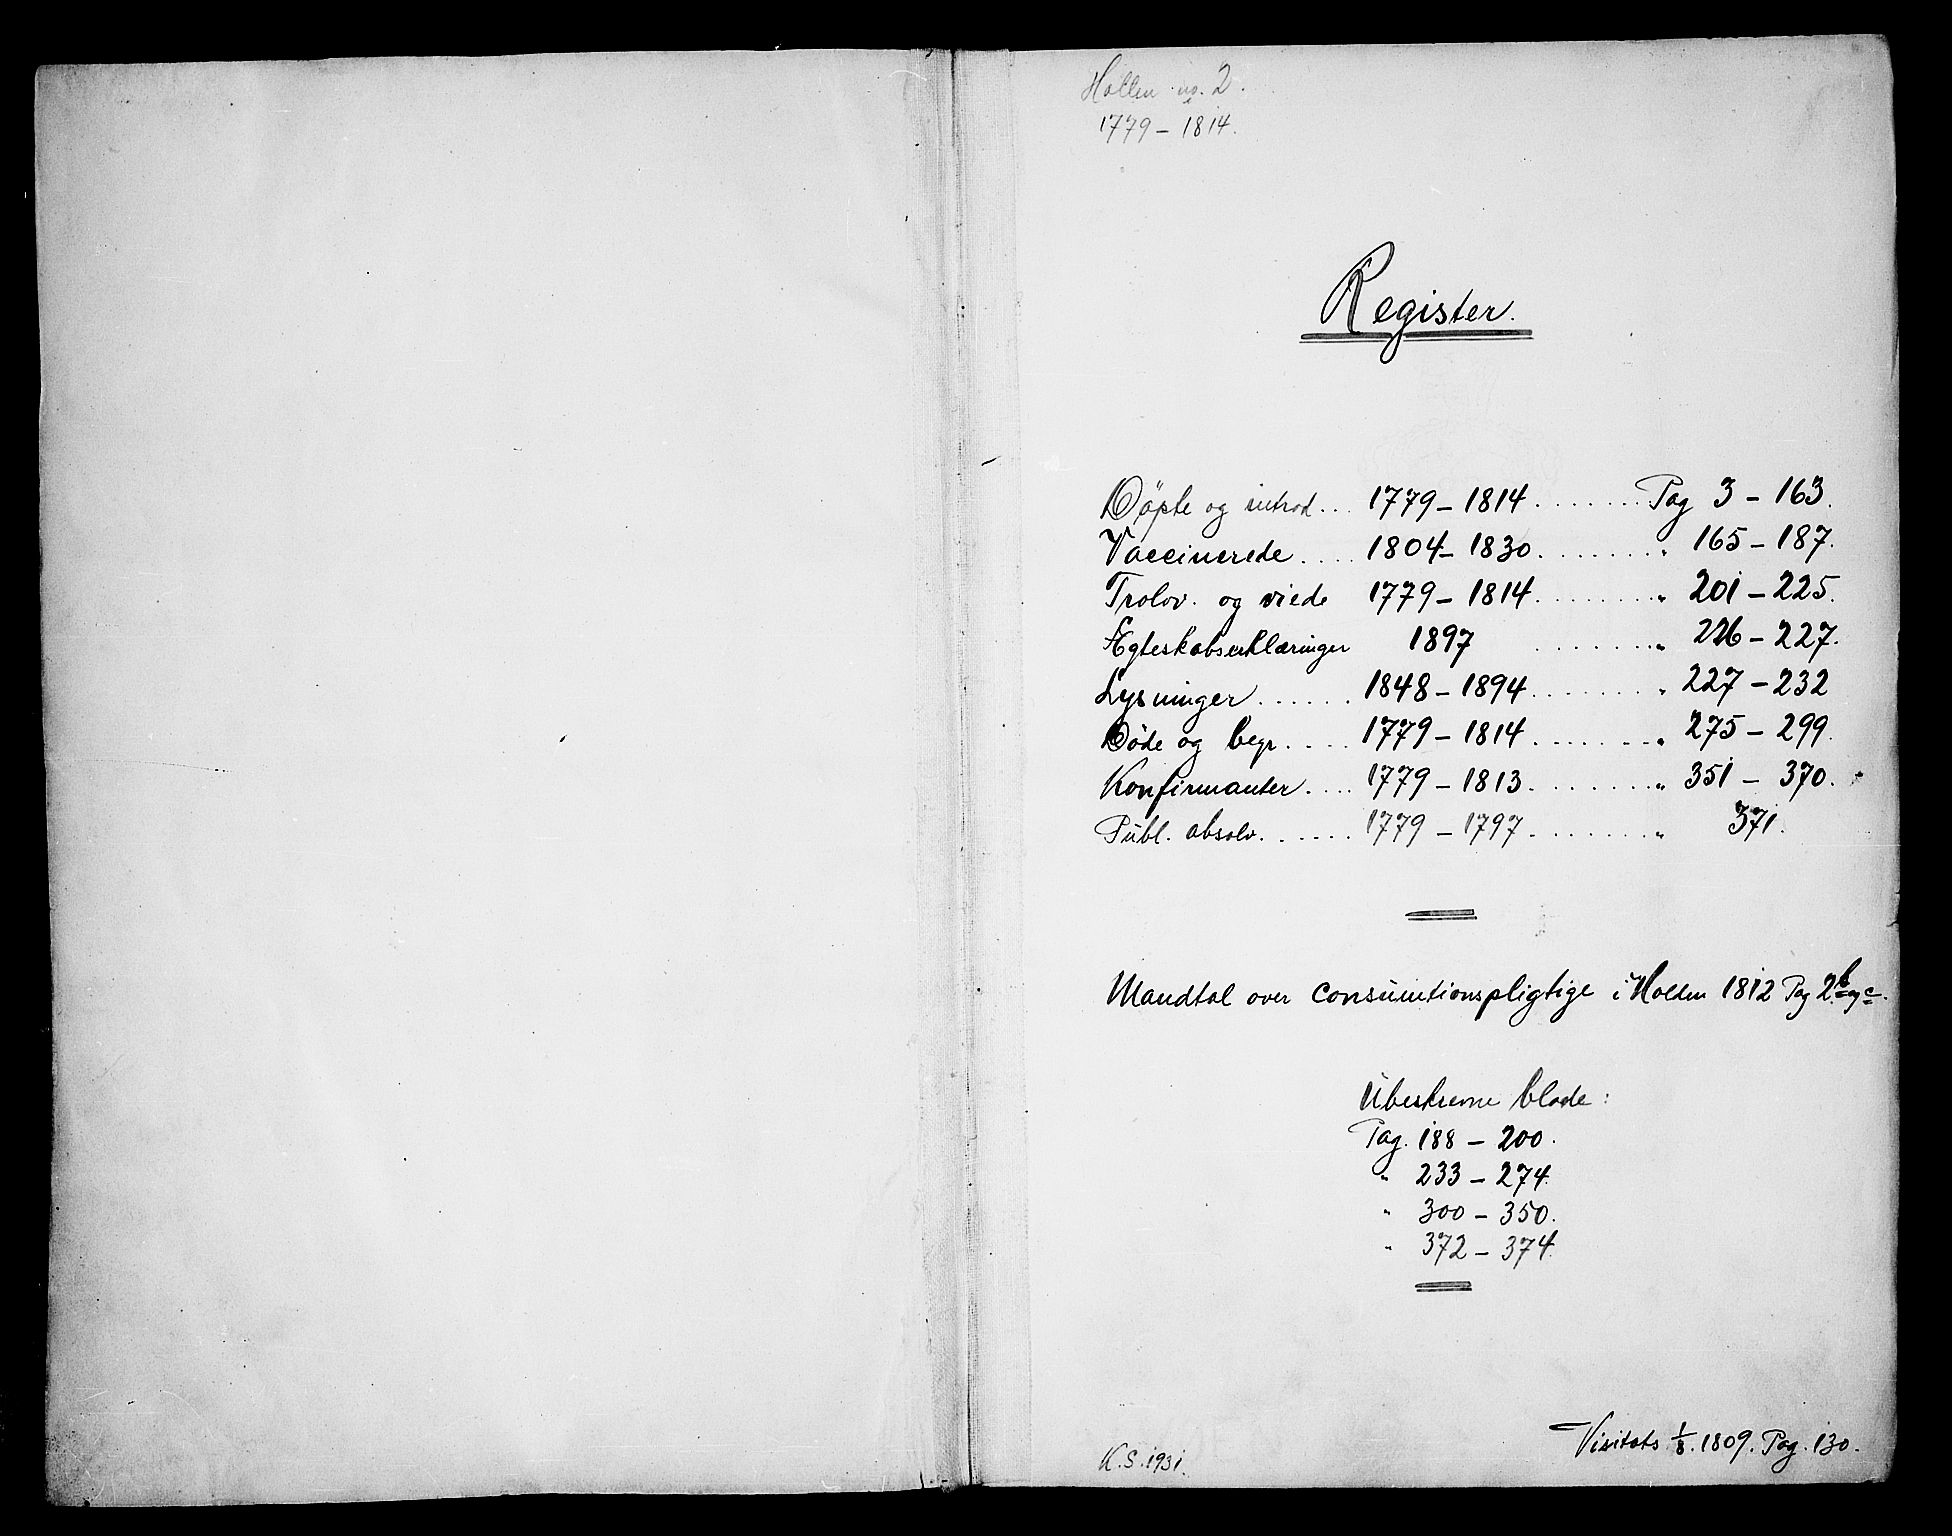 SAKO, Holla kirkebøker, F/Fa/L0002: Ministerialbok nr. 2, 1779-1814